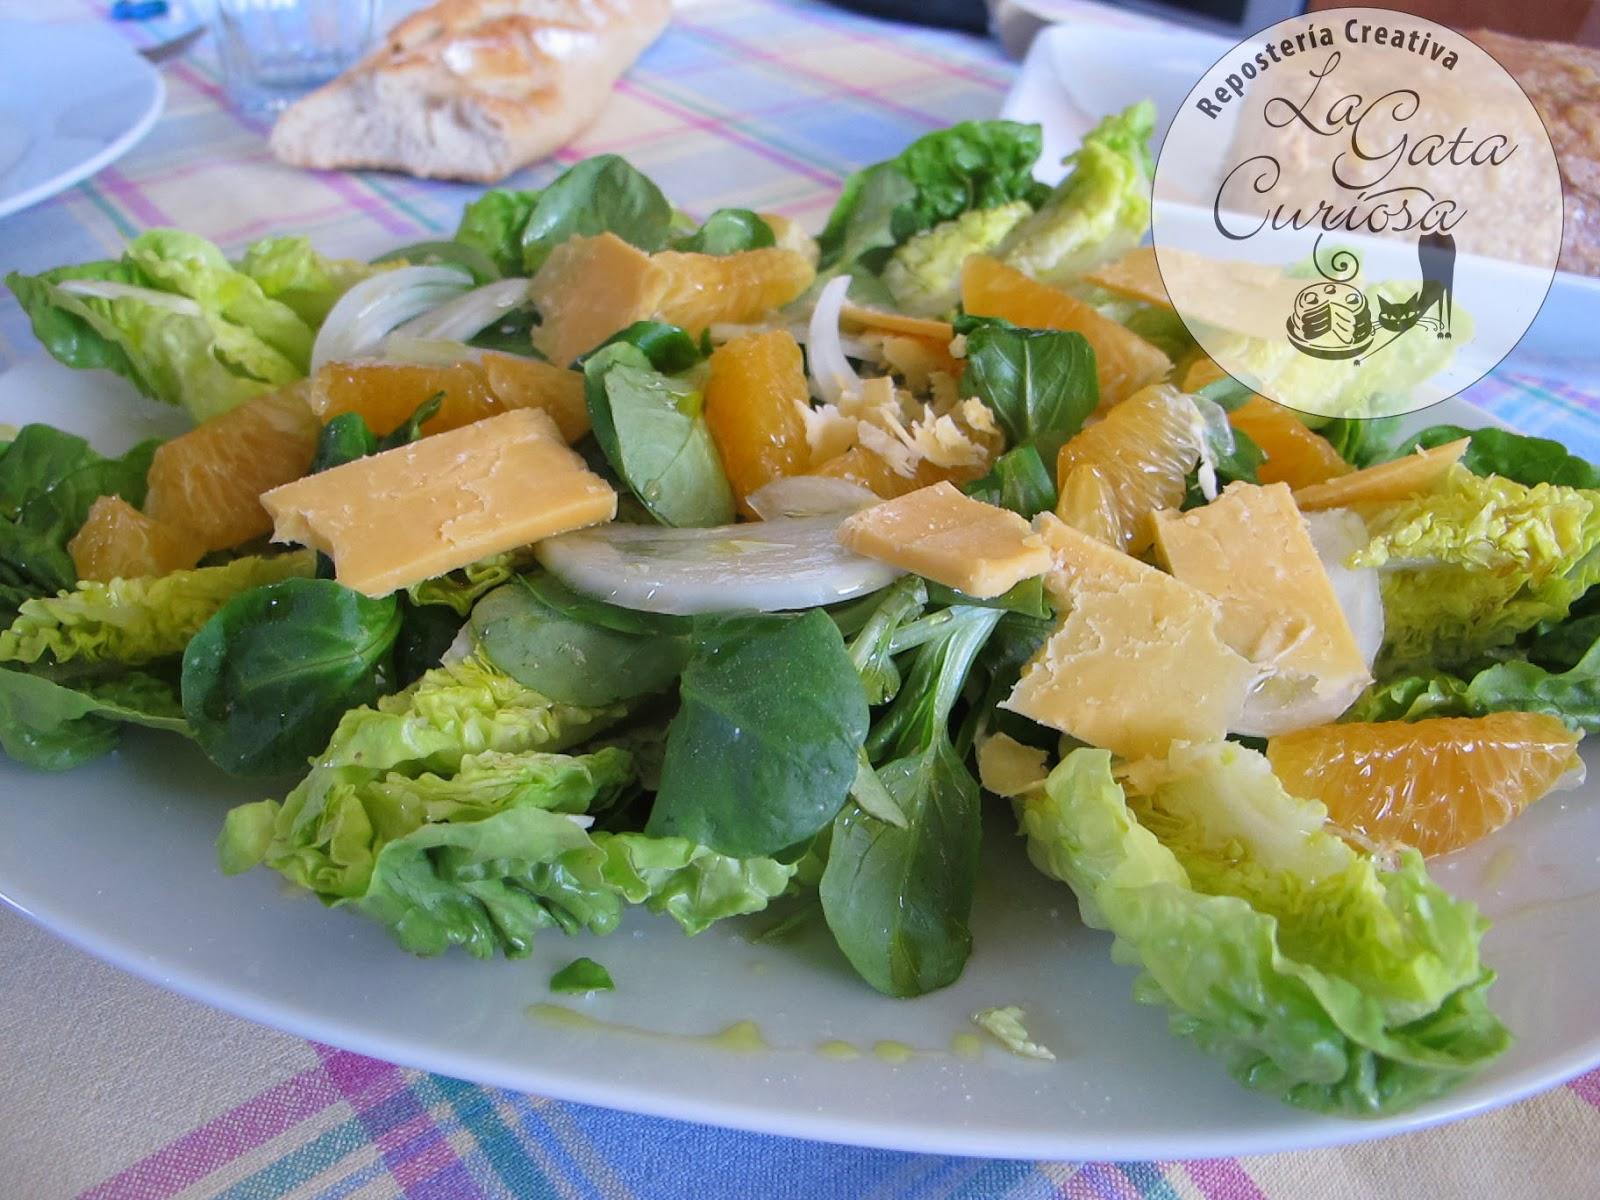 La gata curiosa ensalada de canonigos con mandarinas - Ensaladas con canonigos ...